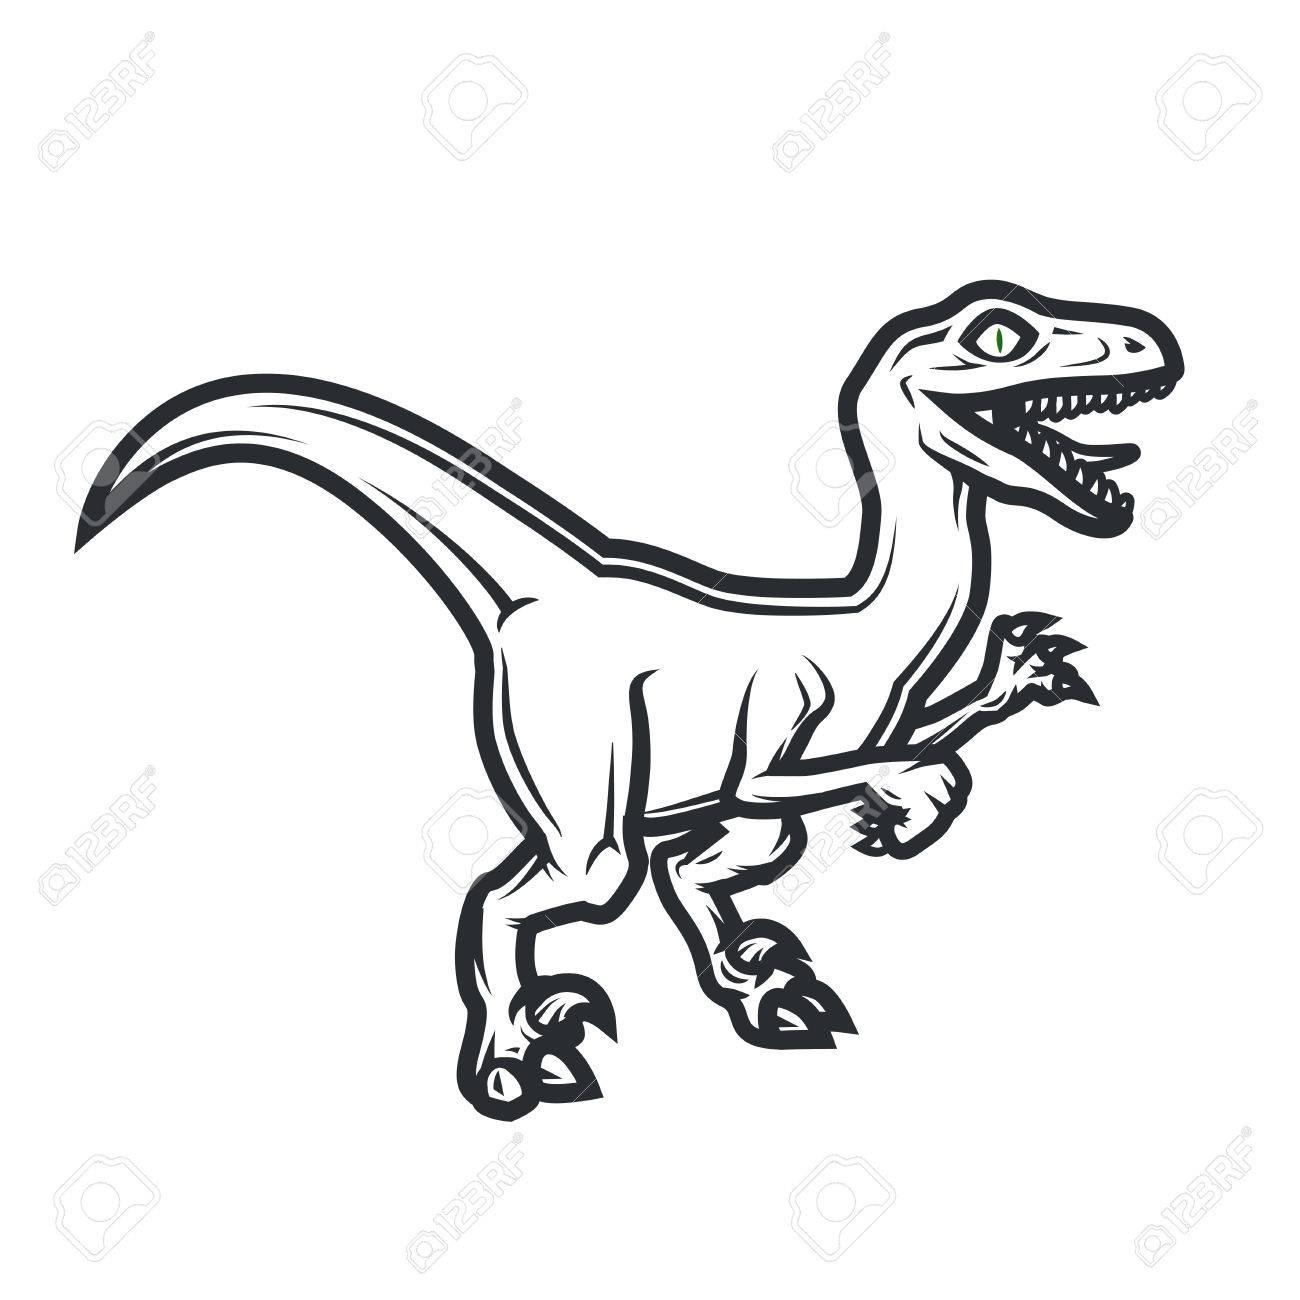 1300x1300 Prehistorical Dino Logo Concept. Raptor Insignia Design. Jurassic